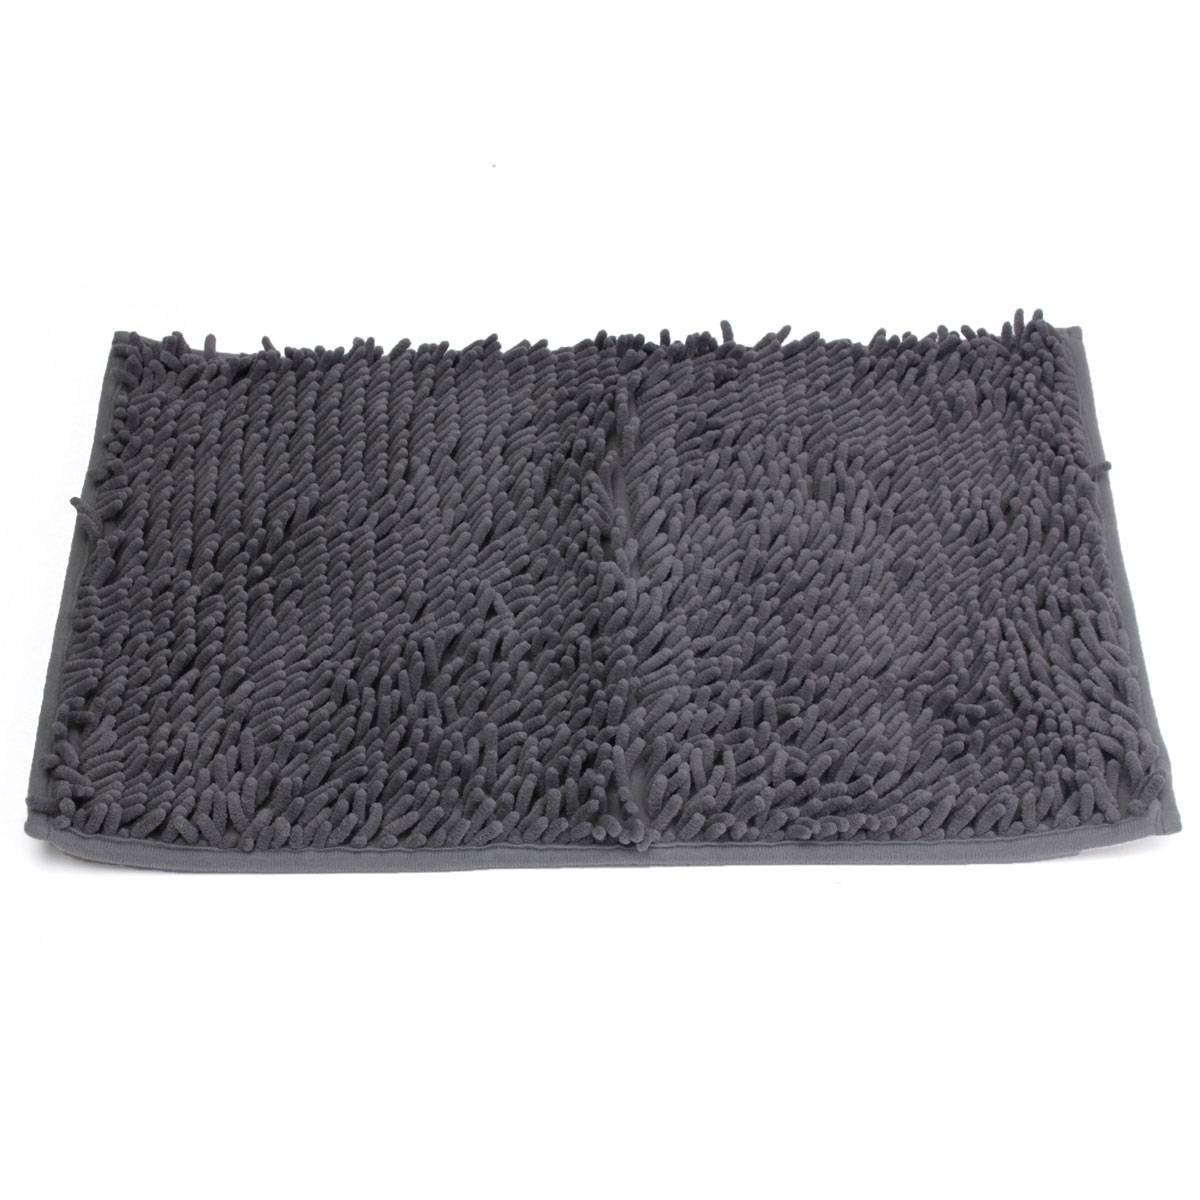 Black bathroom mats - 1pcs Washable Bathroom New Shaggy Rugs Non Slip Bath Mat Thick 40x60cm Dark Gray